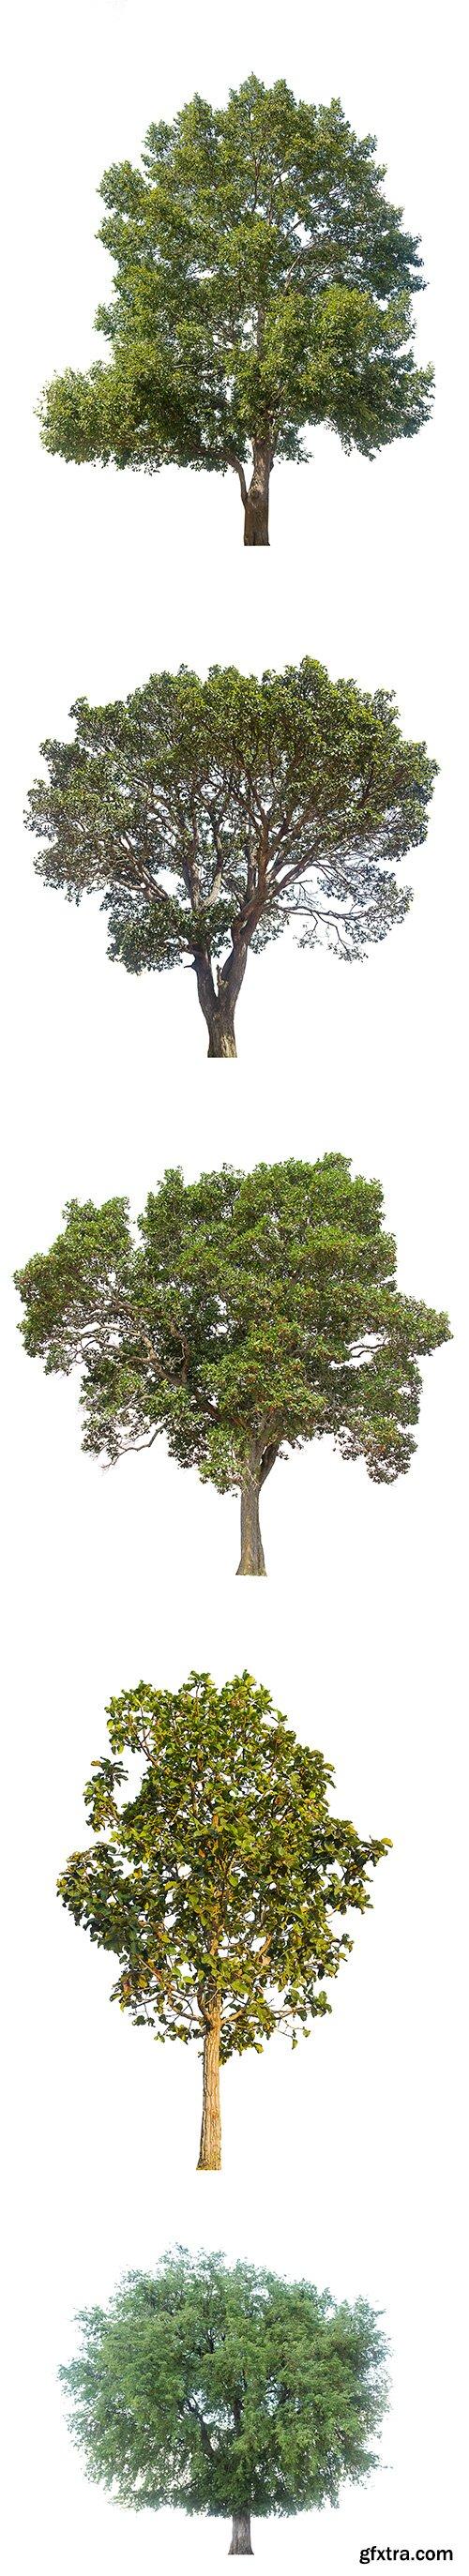 Green Tree Isolated - 5xJPGs